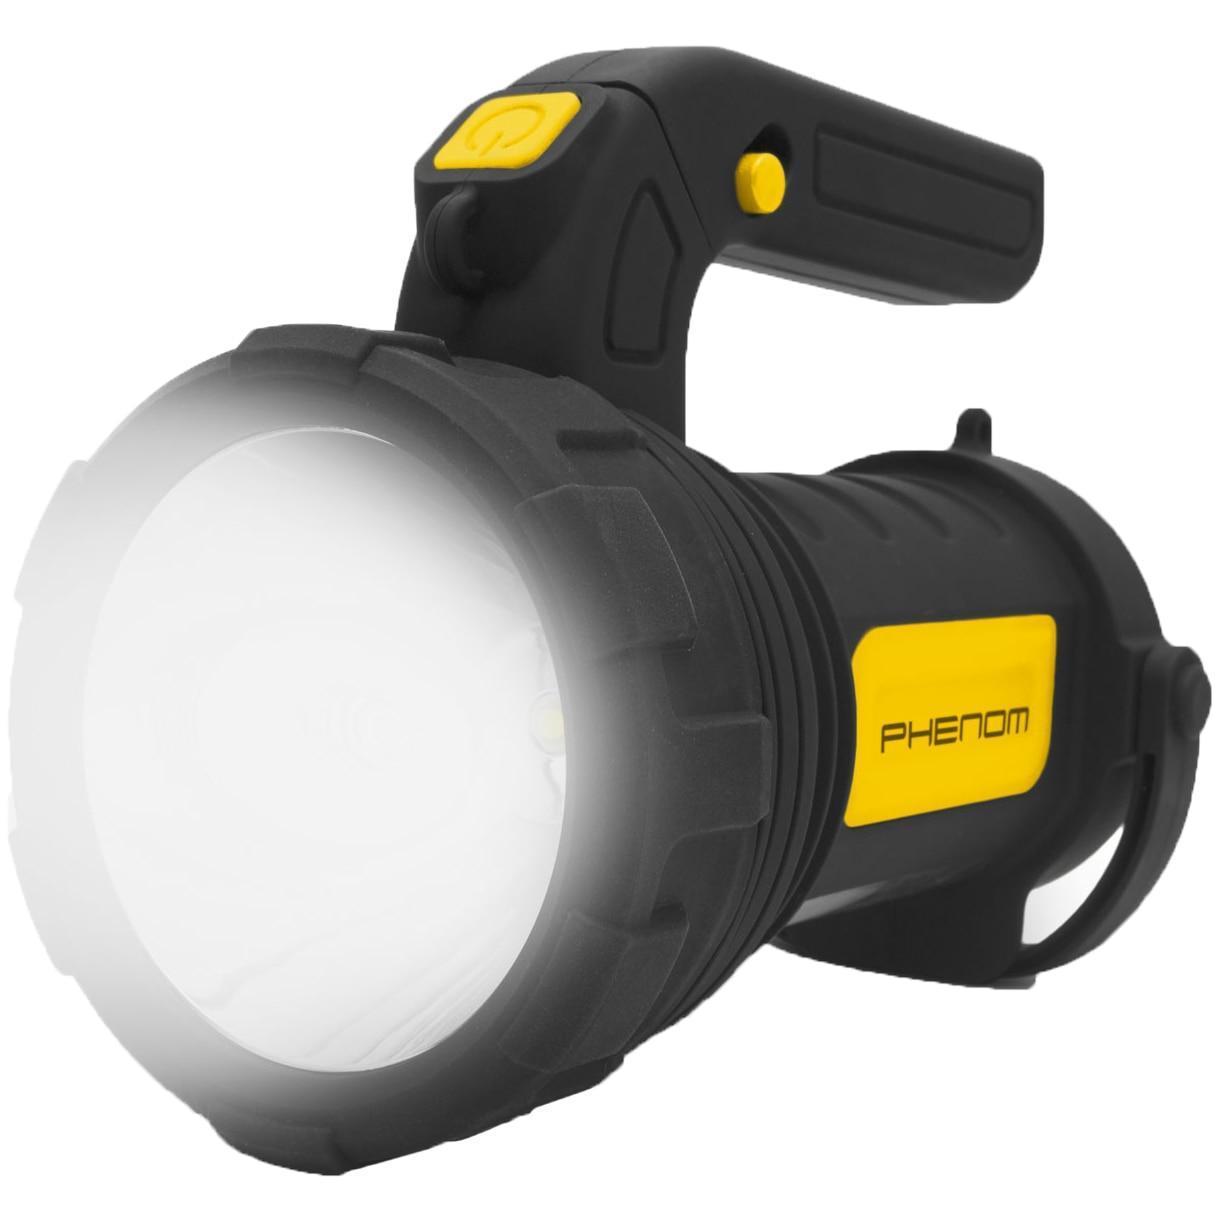 Fotografie Lanterna LED de lucru Phenom, 275 lm, lumina rece, 3xAA, Negru/Galben